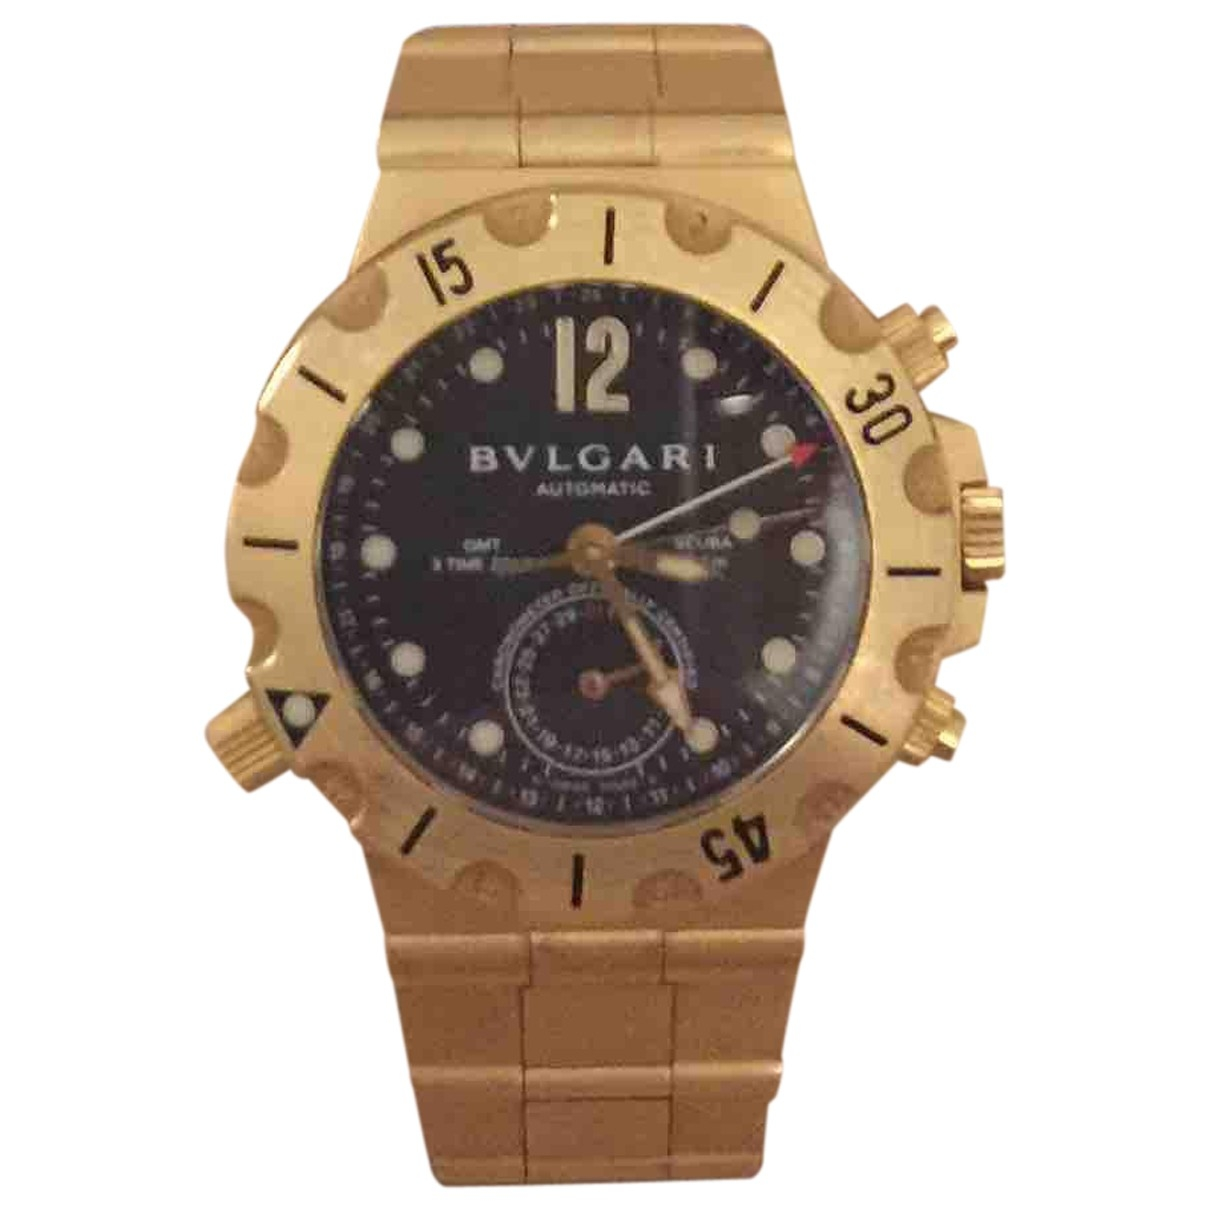 Relojes Diagono de Oro amarillo Bvlgari